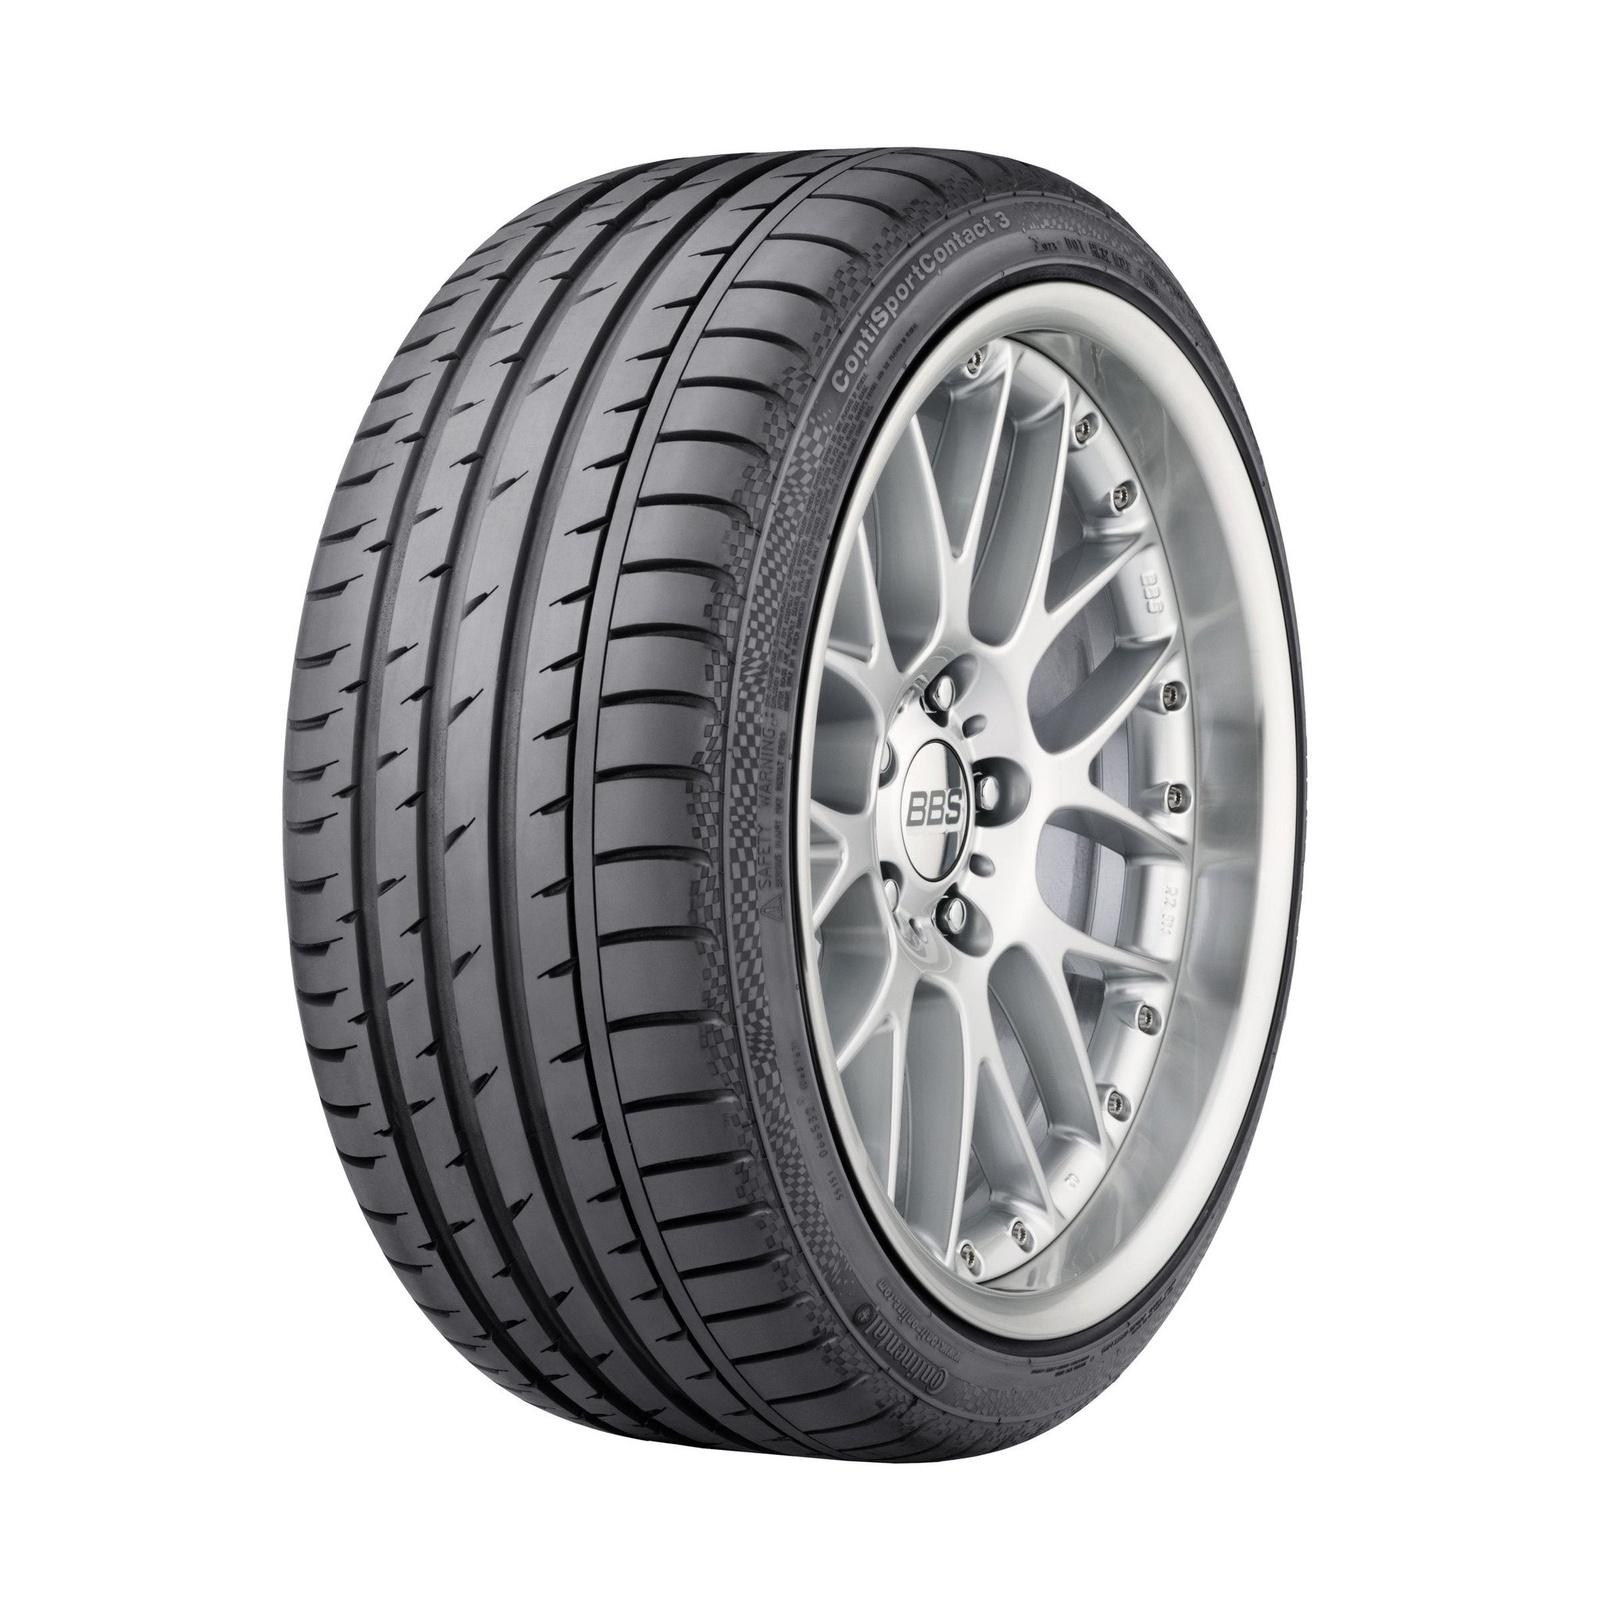 Шины для легковых автомобилей Шины автомобильные летние зимняя шина continental contiwintercontact ts 830 p 235 55 r17 99h c н ш fr ao